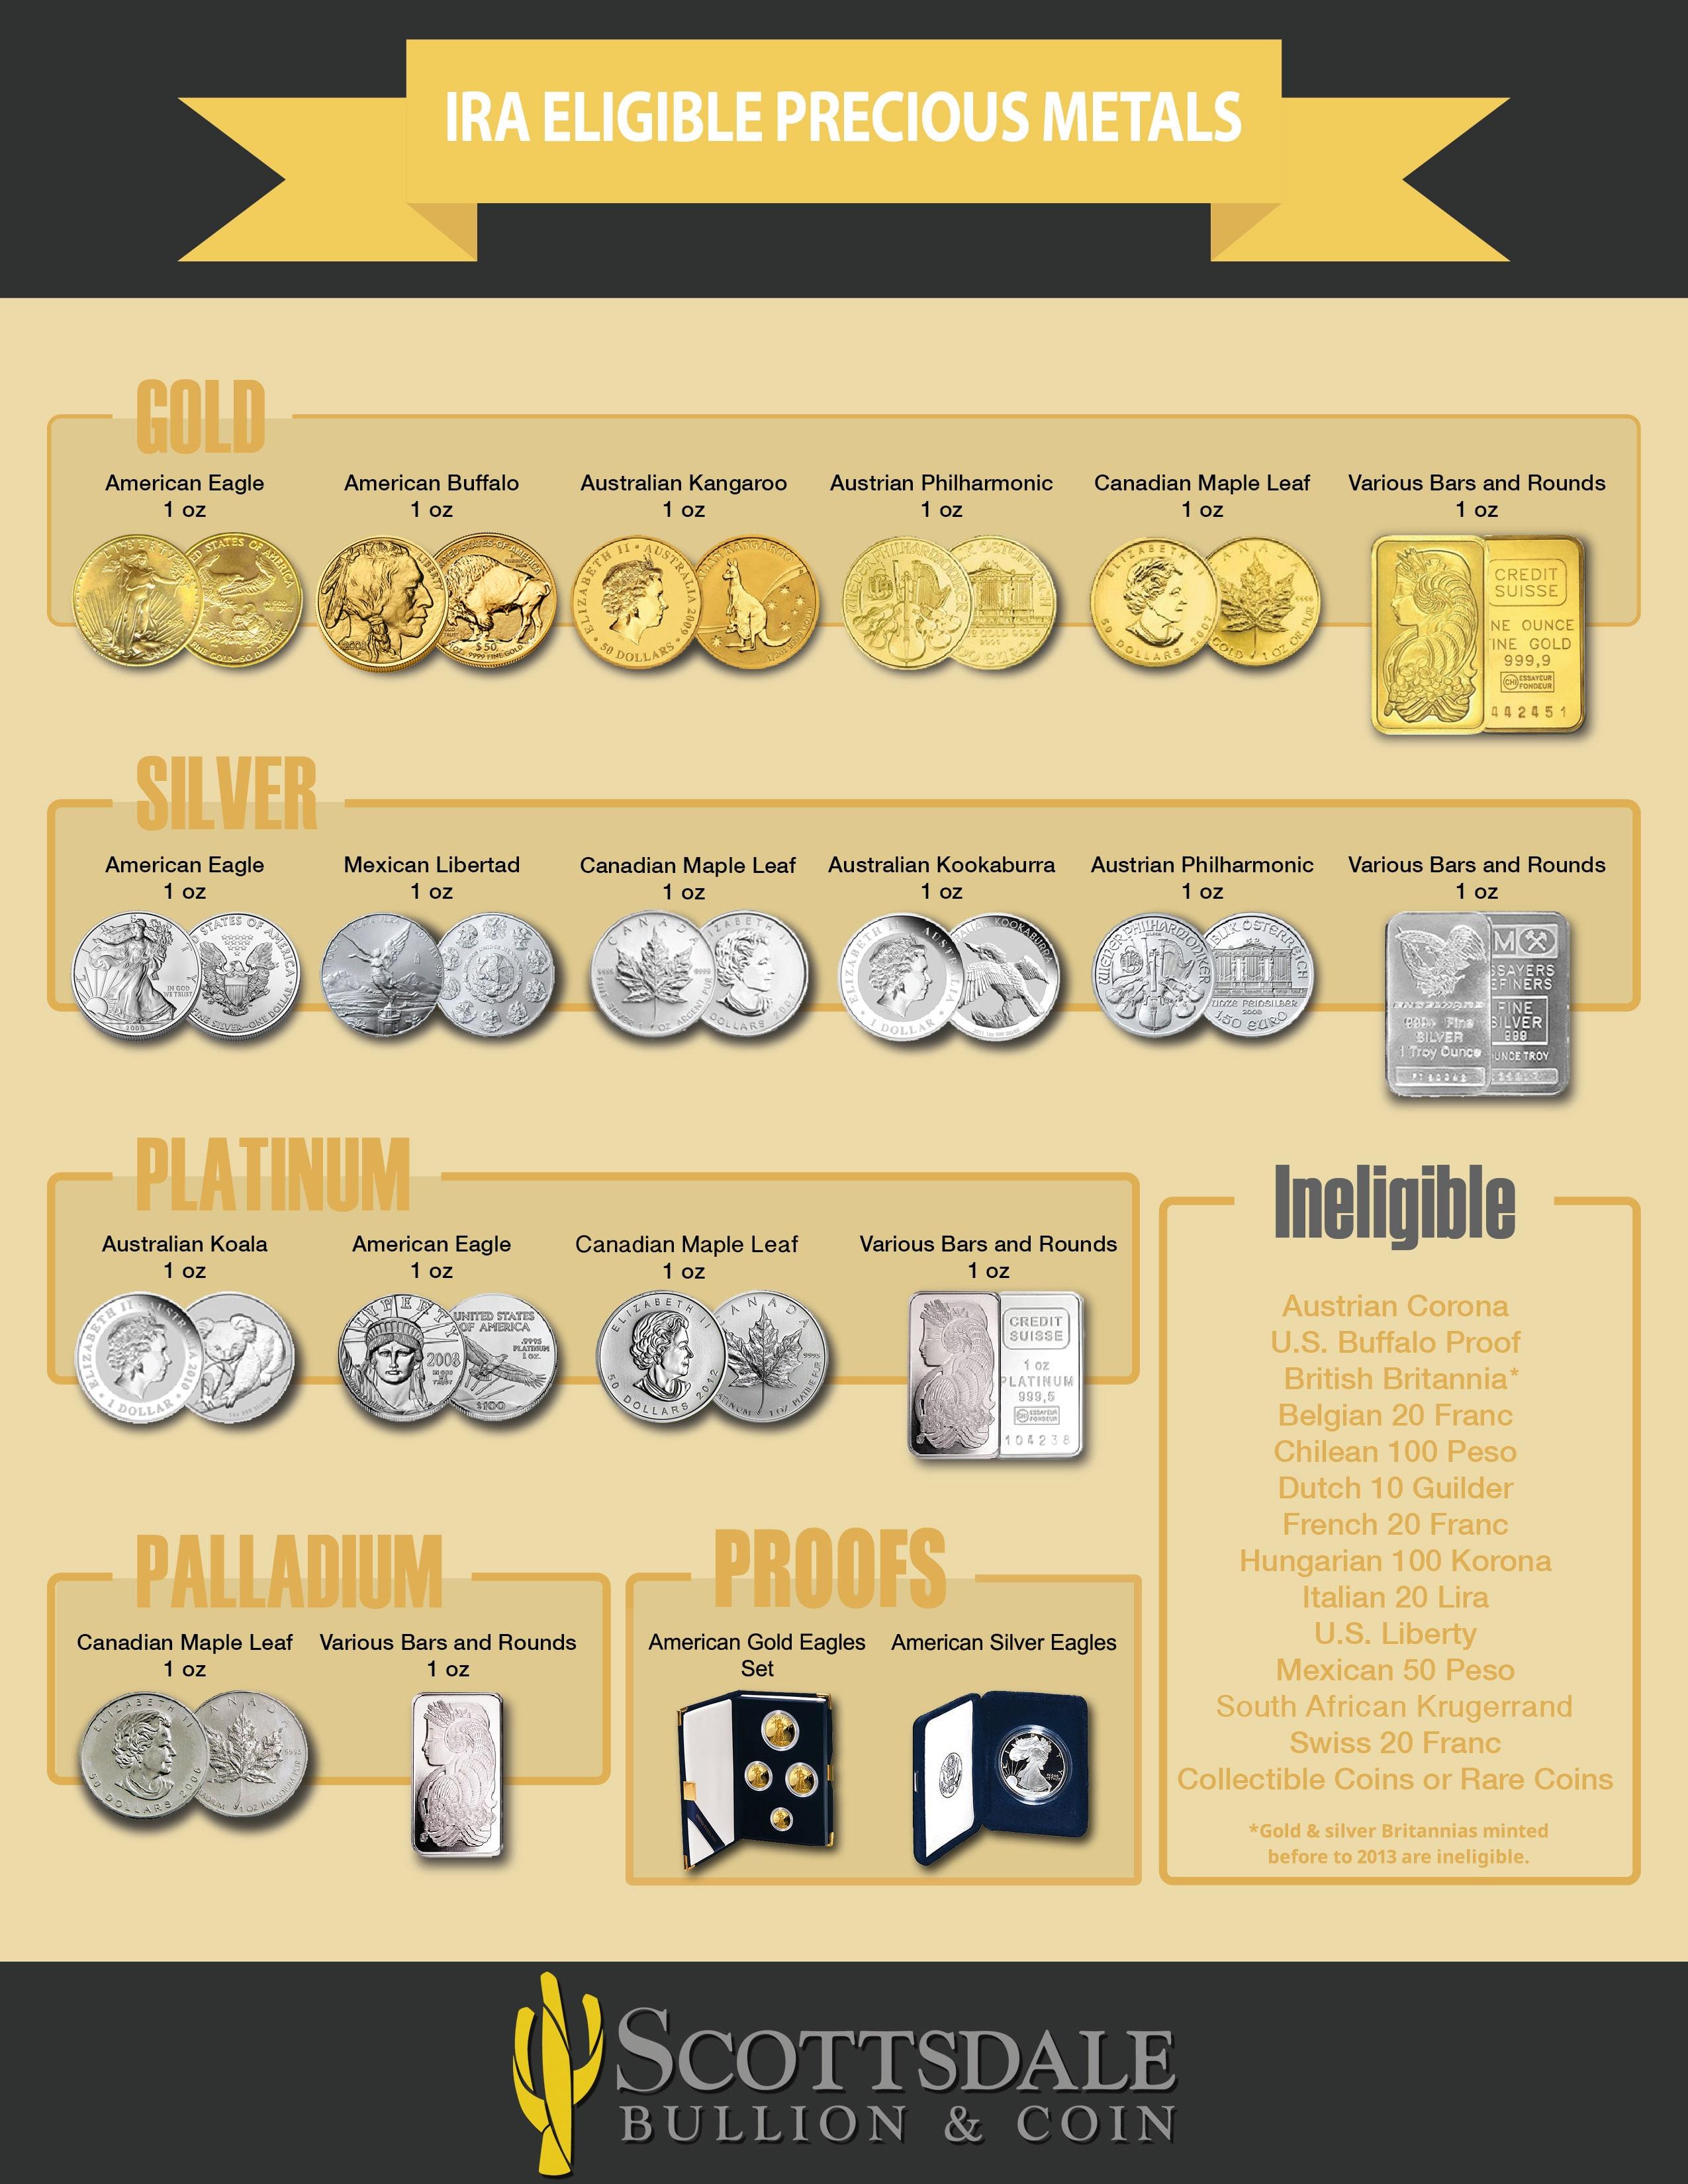 Ira Approved Precious Metals